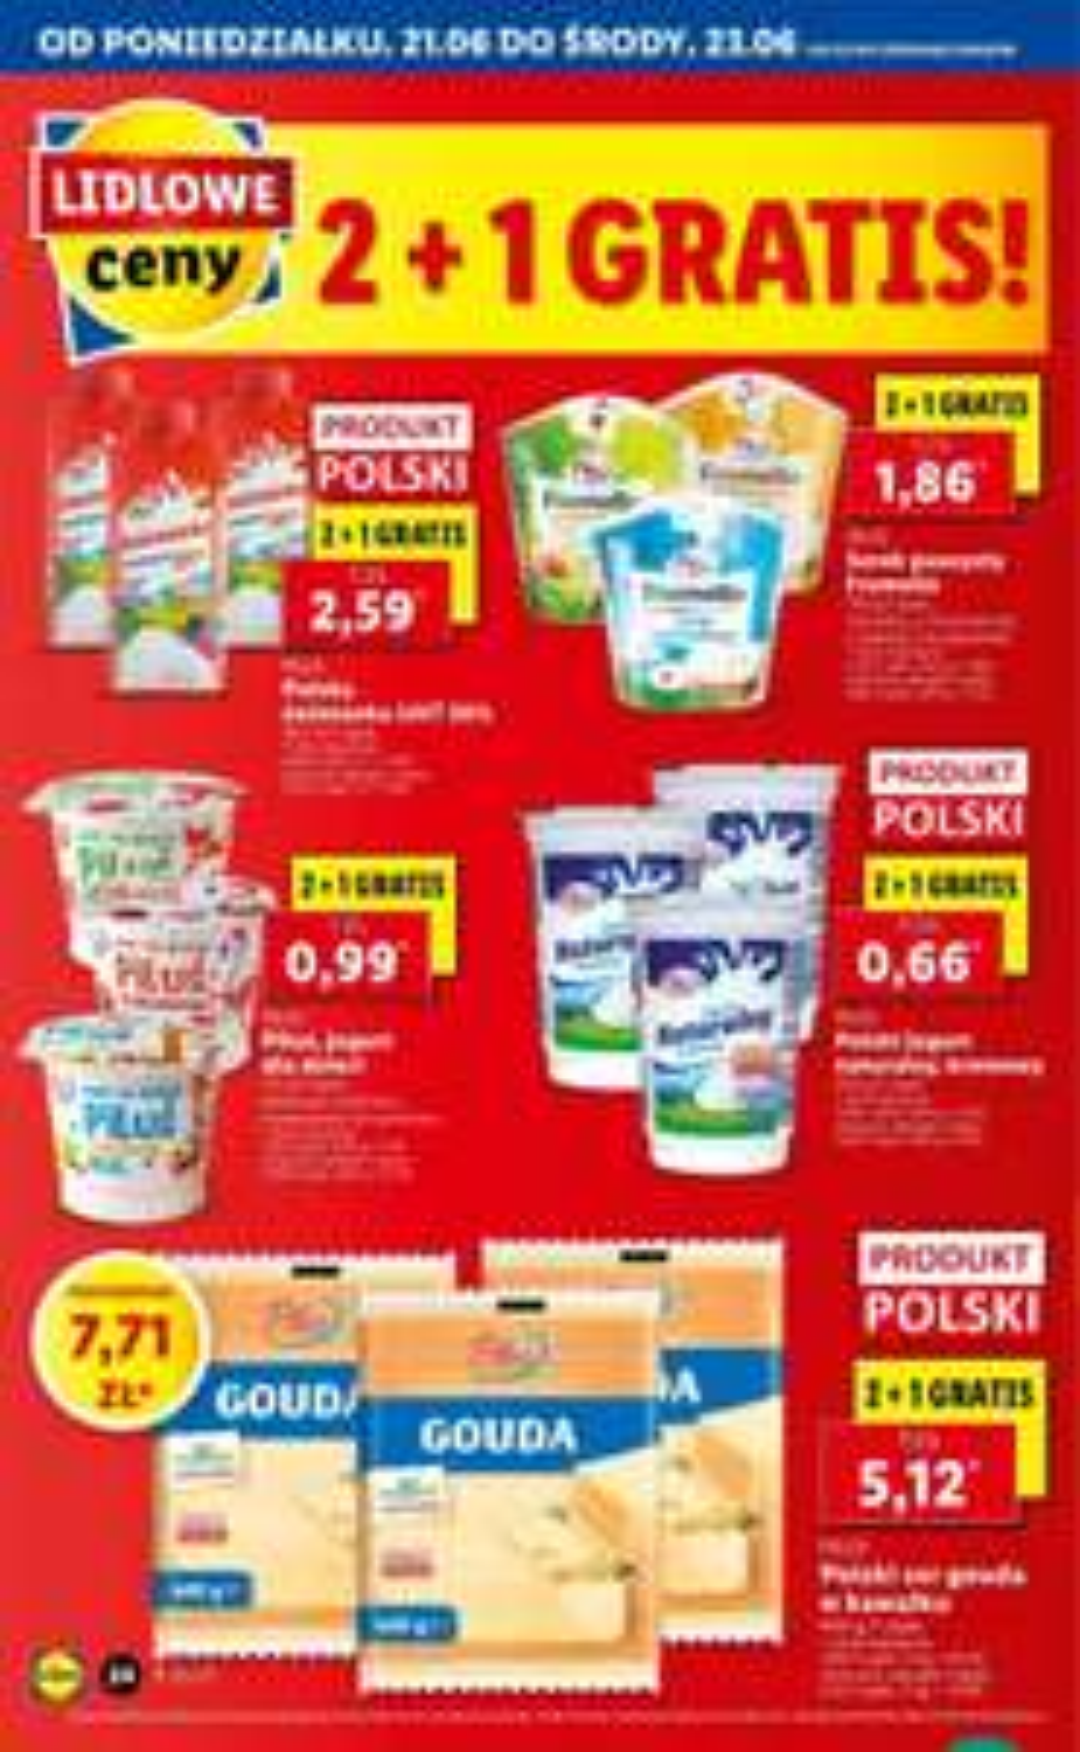 Produkty mleczne 2+1 gratis Lidl